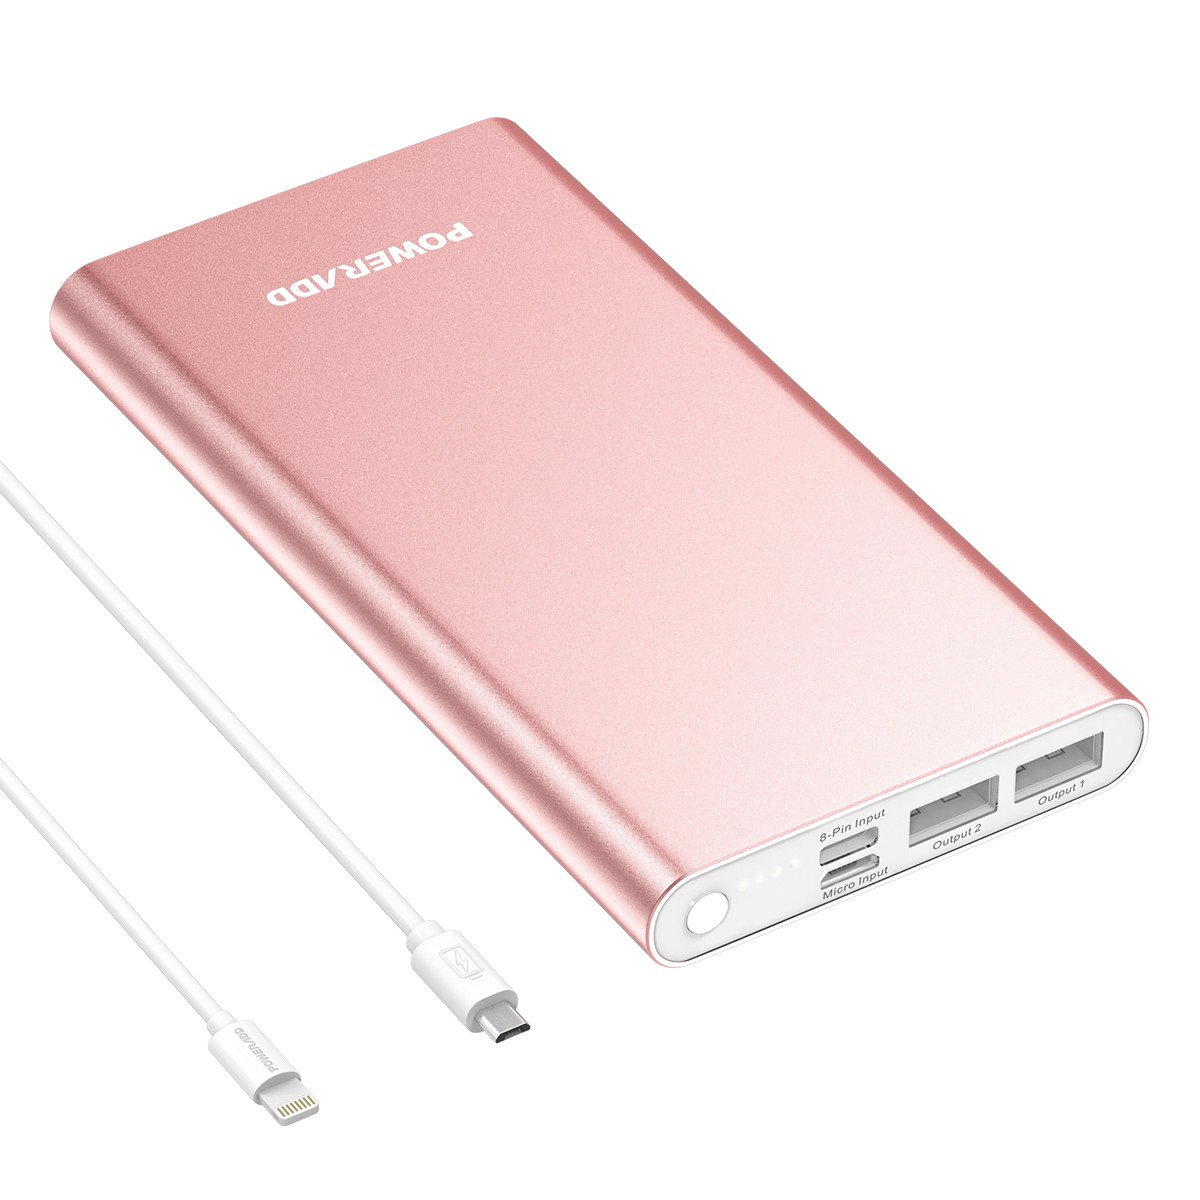 Poweradd Pilot 8GS 12000mAh iPhone Lightning Externer Akku Handy Ladegerät mit Lightning und Micro USB Input, speziell für iPhone 7, 7 plus, 6, 6 plus, 6s, 5, 5s, 5c und anroid Handys, Rosagold